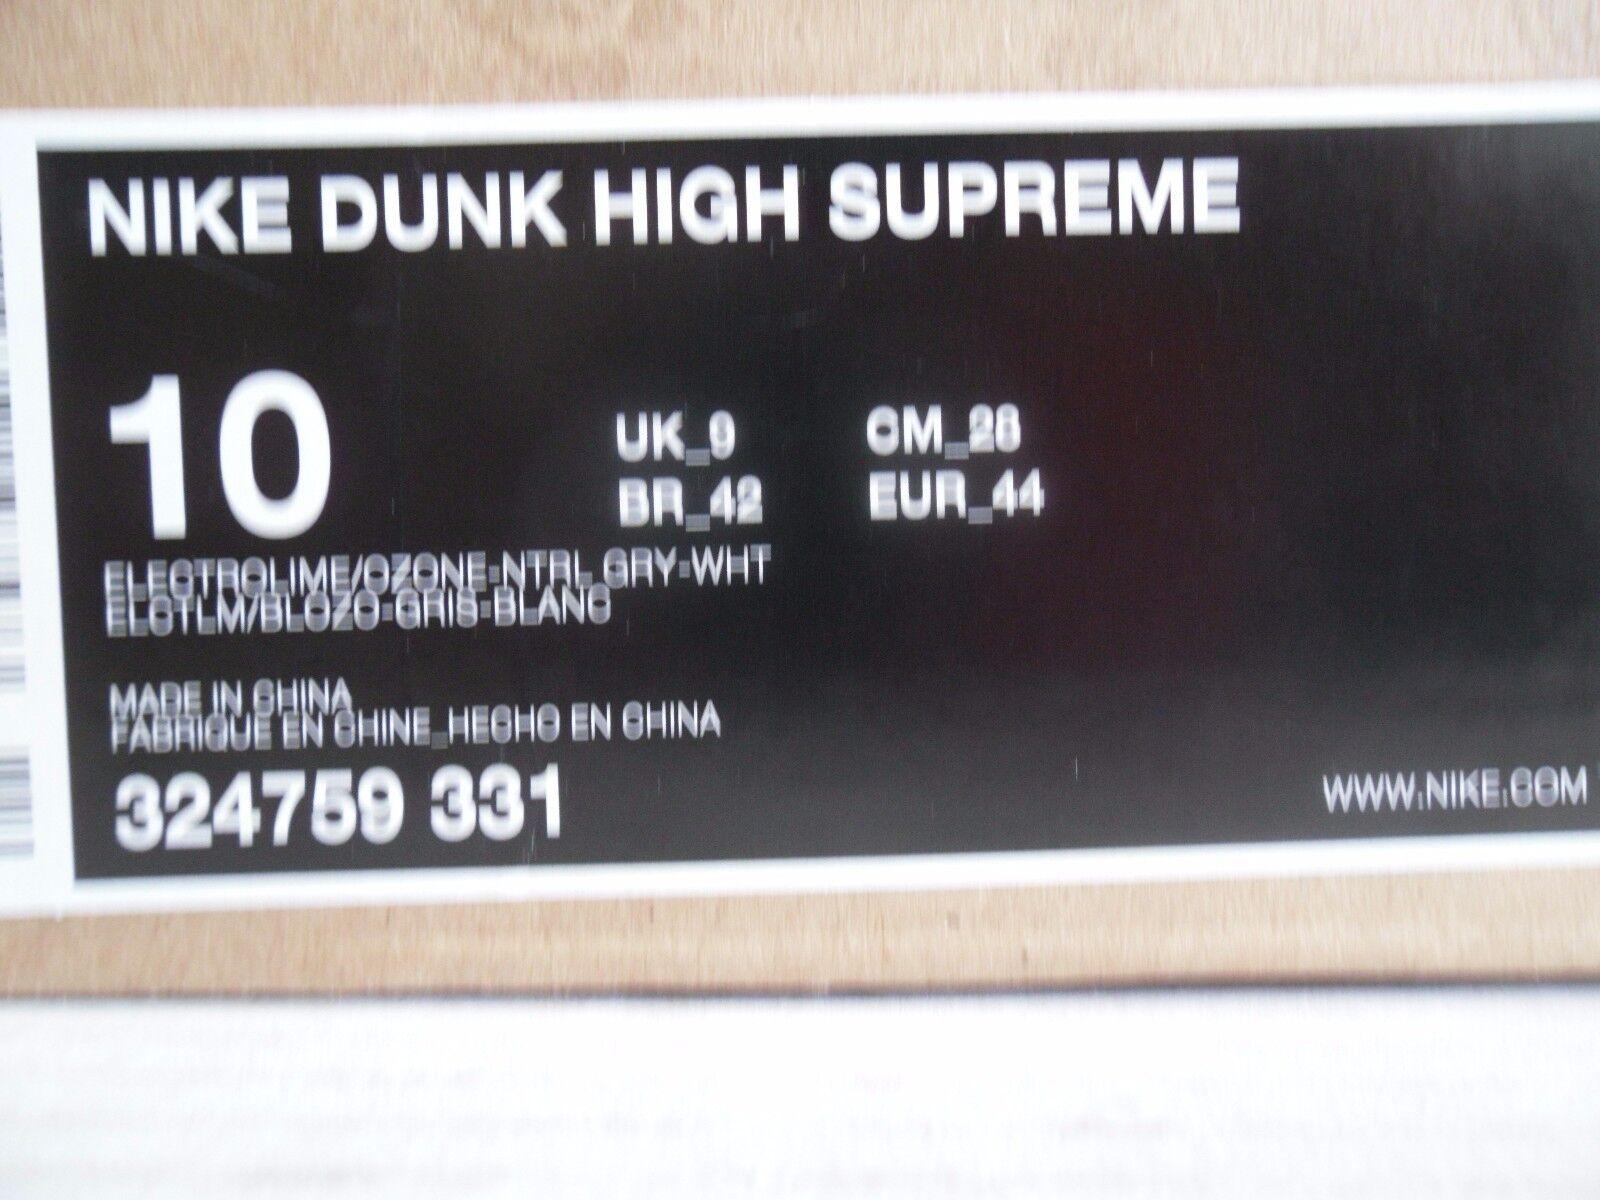 nike sz dunk hohe oberste electrolime-ozone-grey-white sz nike 10 [324759-331] ee56e0